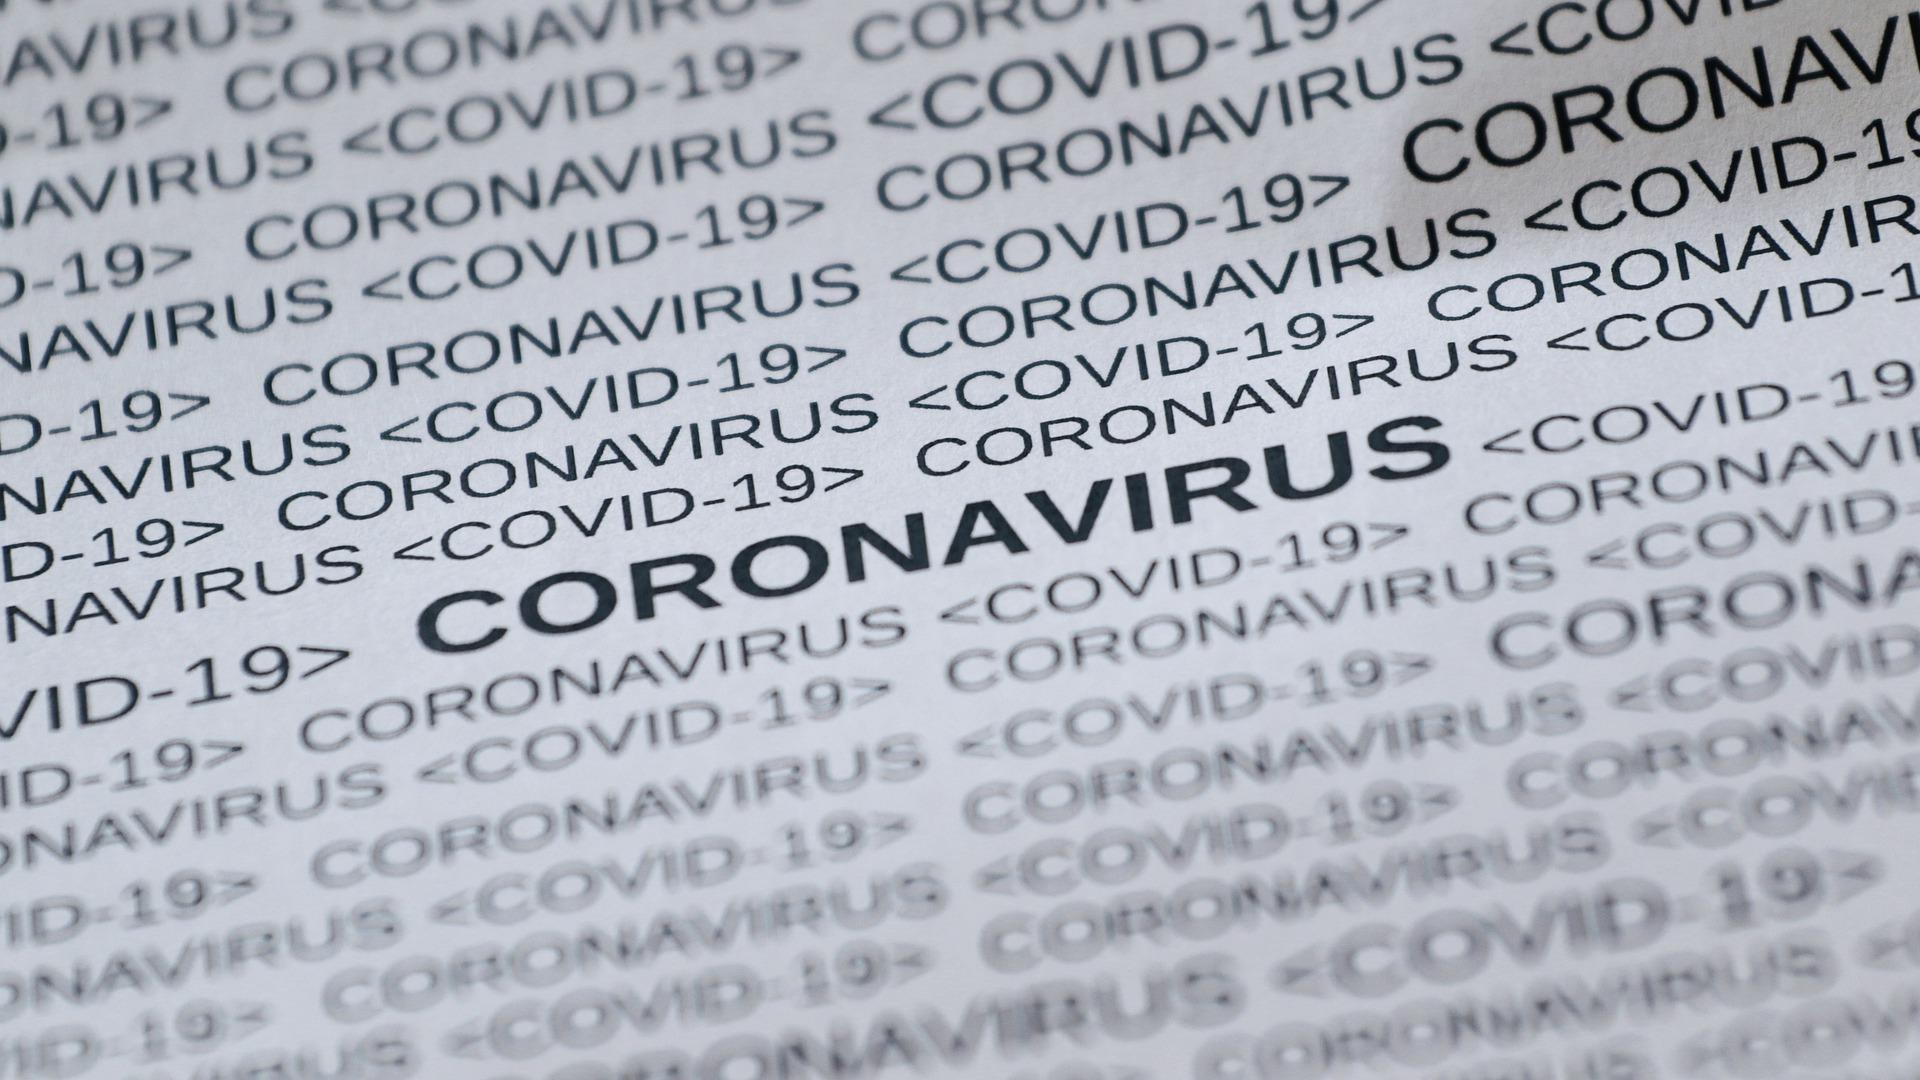 czwarta fala koronawirusa - grafika wpisu